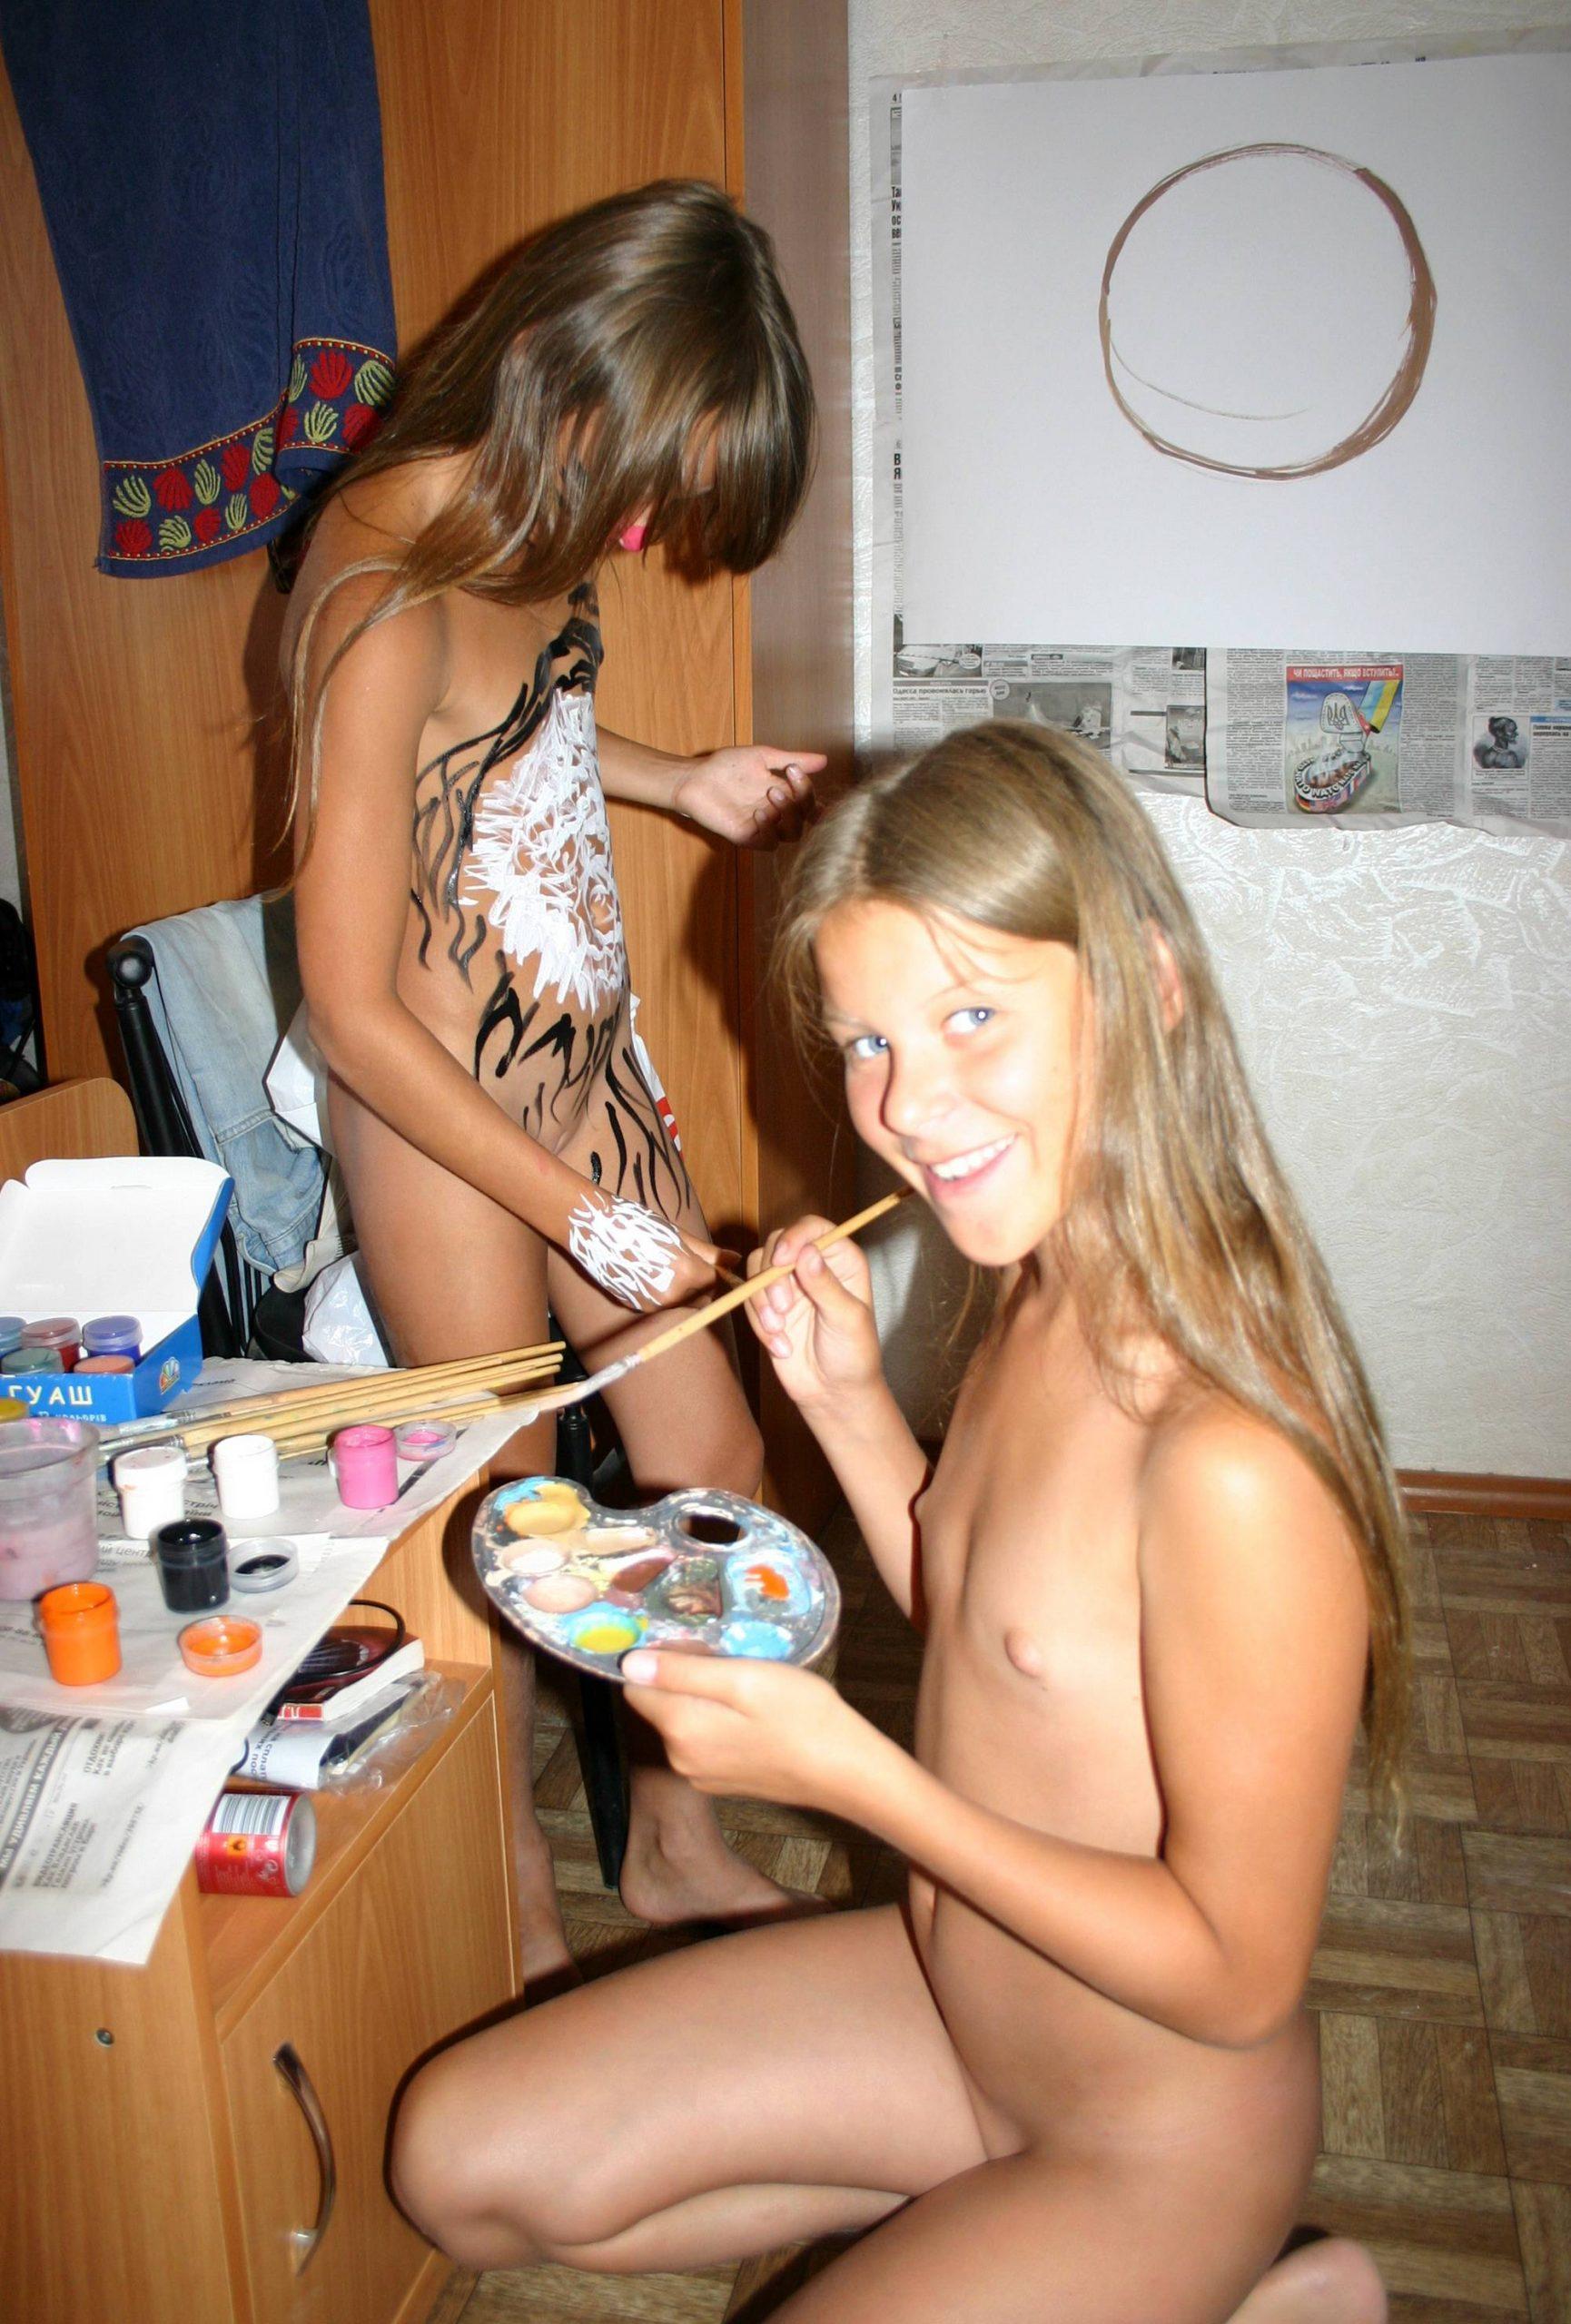 Body Painting Girls Activity - 4